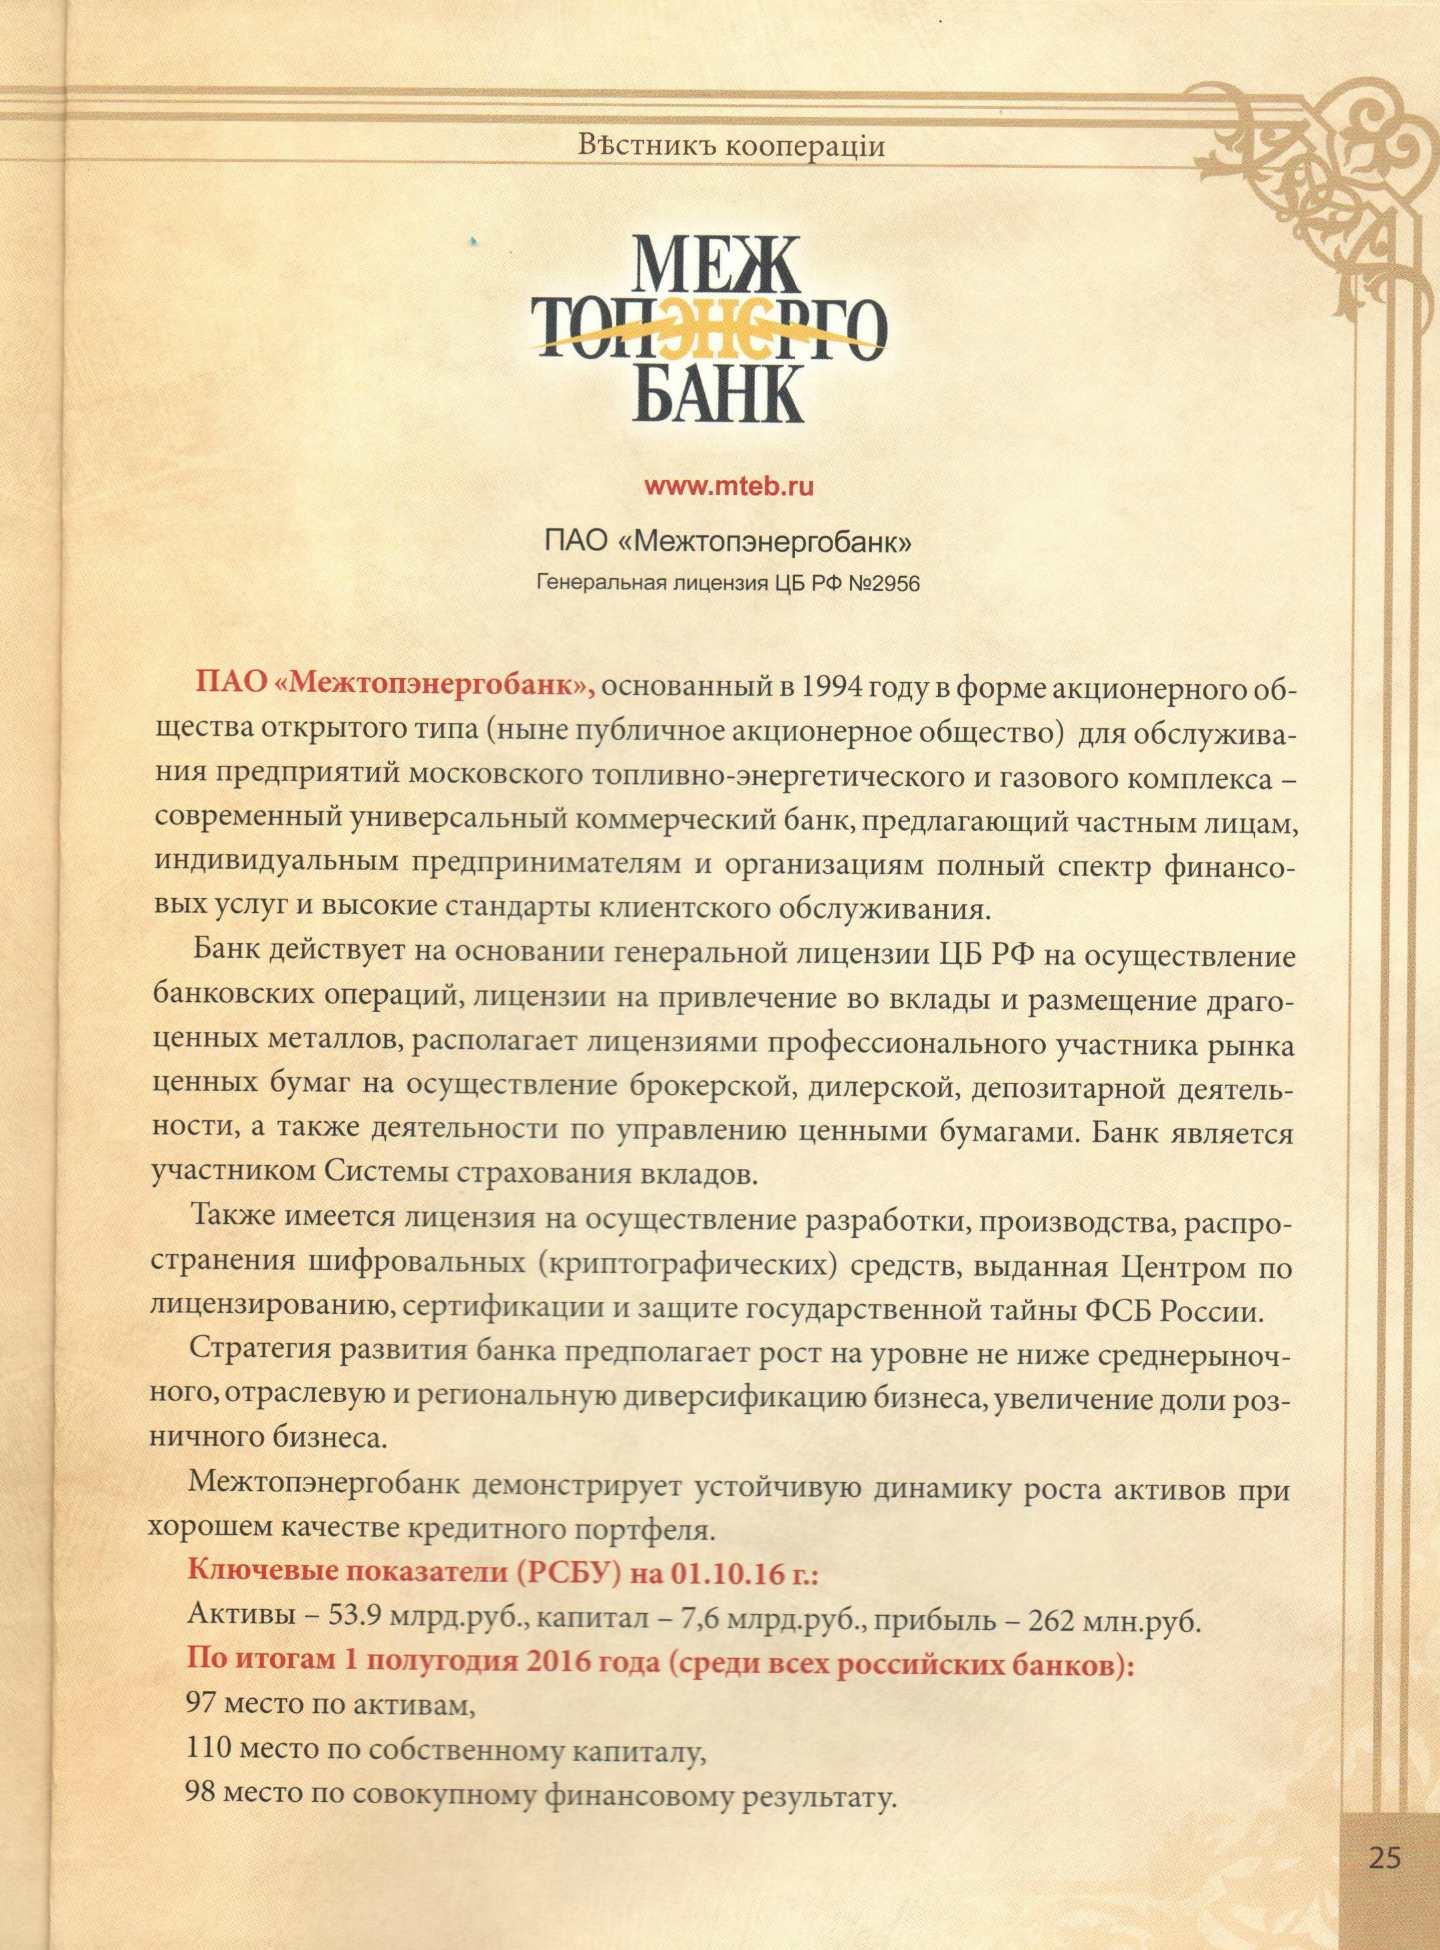 Вестник кооперации-25